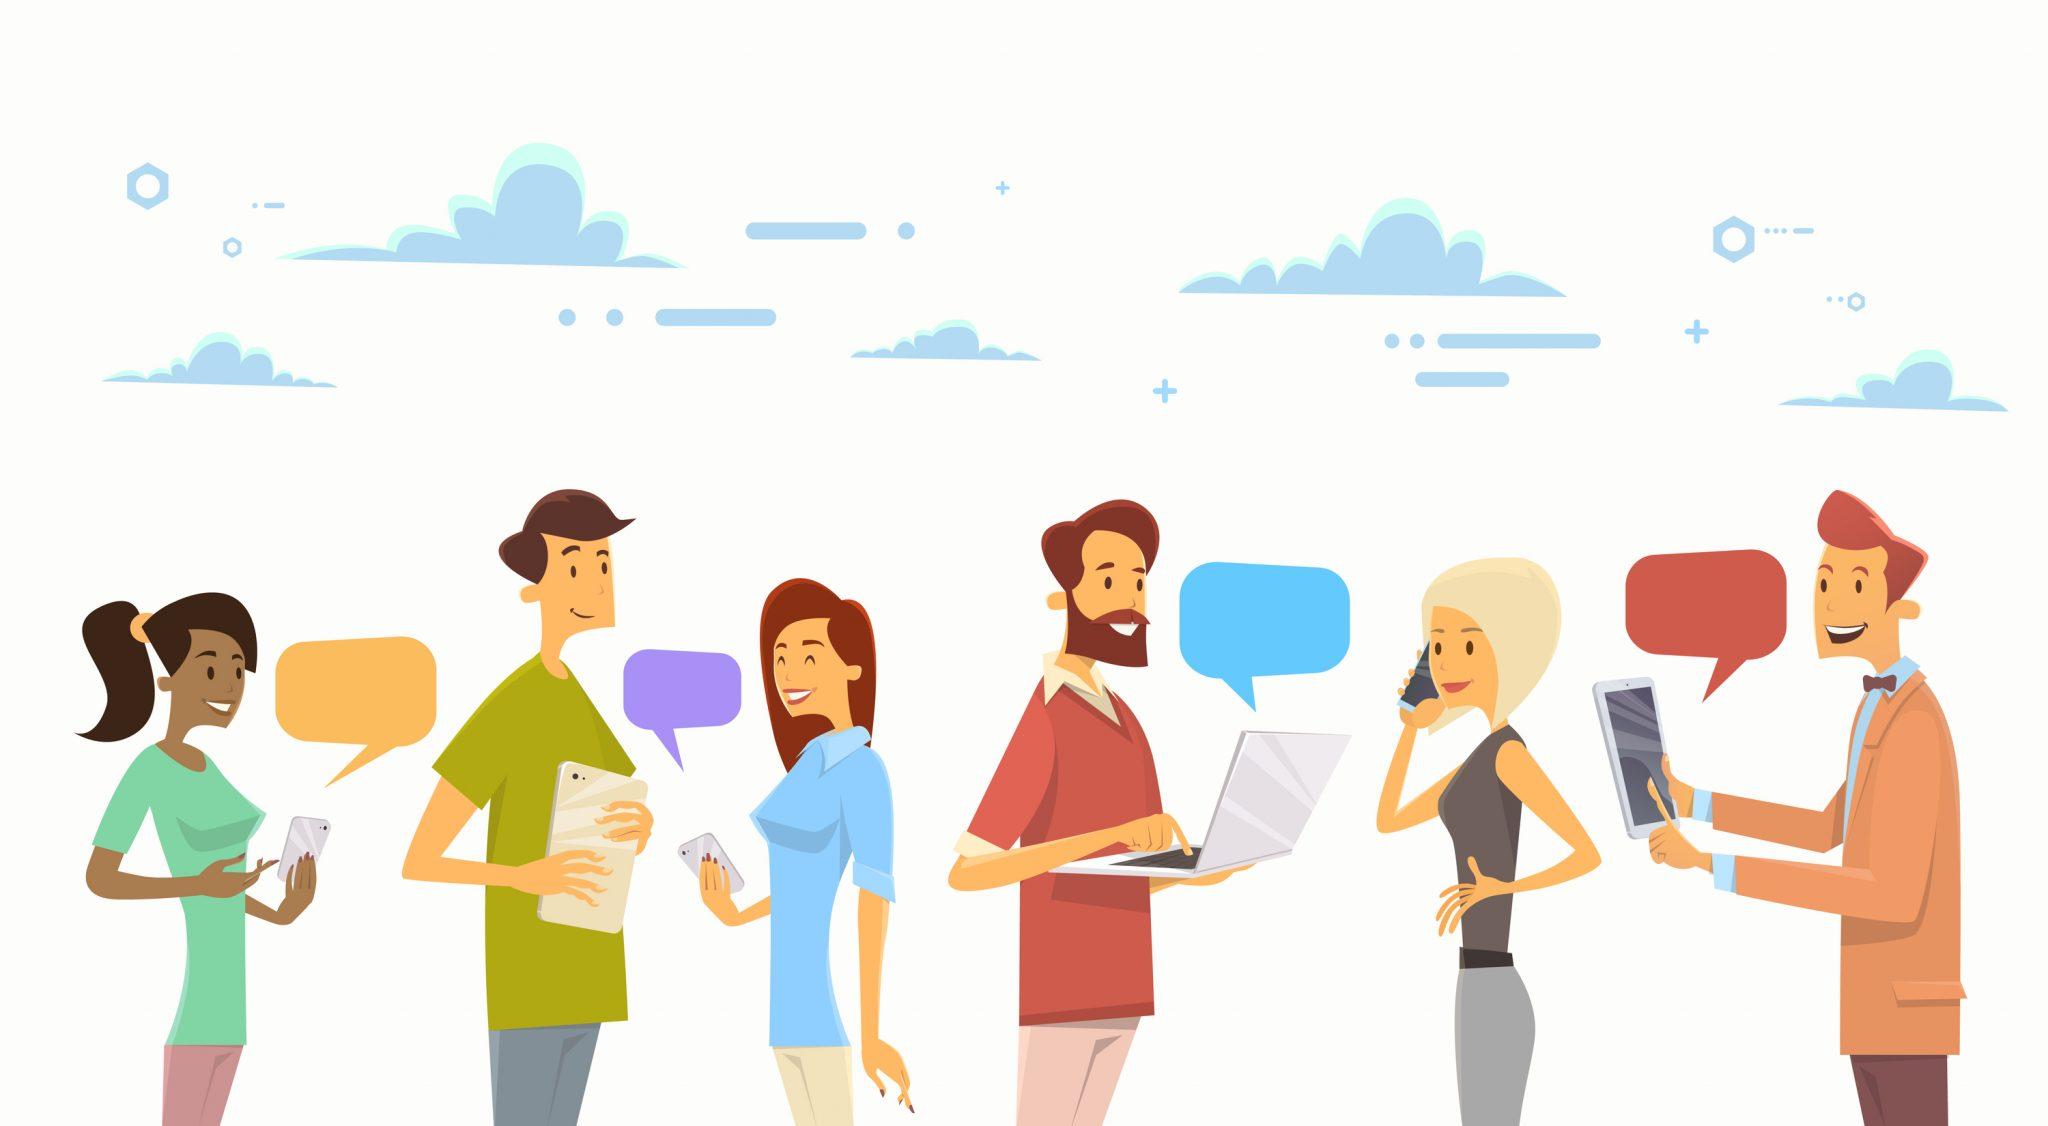 influencer metrics influencer social metrics customer journey